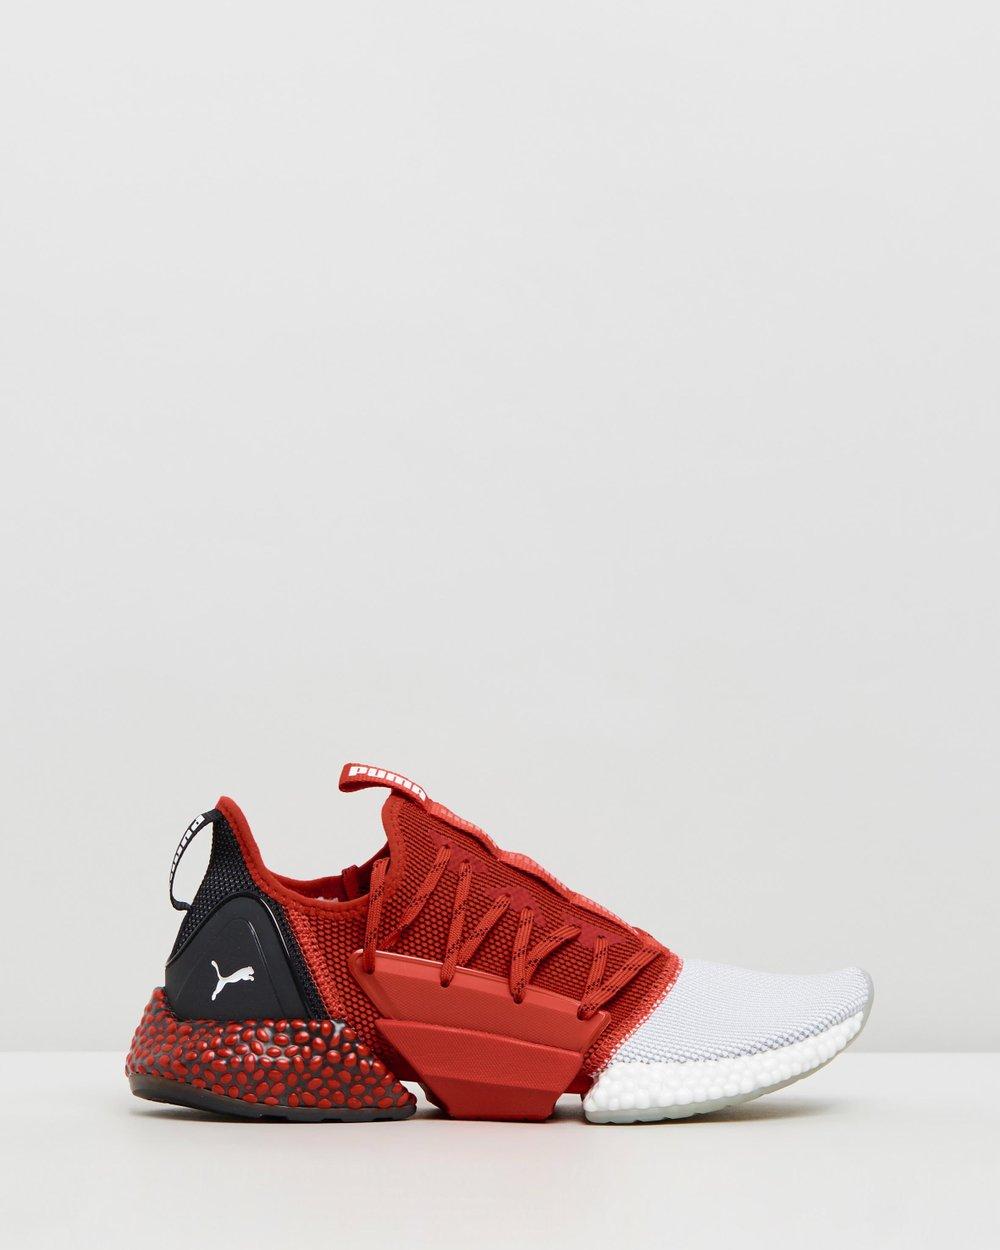 c8b8a7f9083 Hybrid Rocket Runner Shoes - Men s by Puma Online